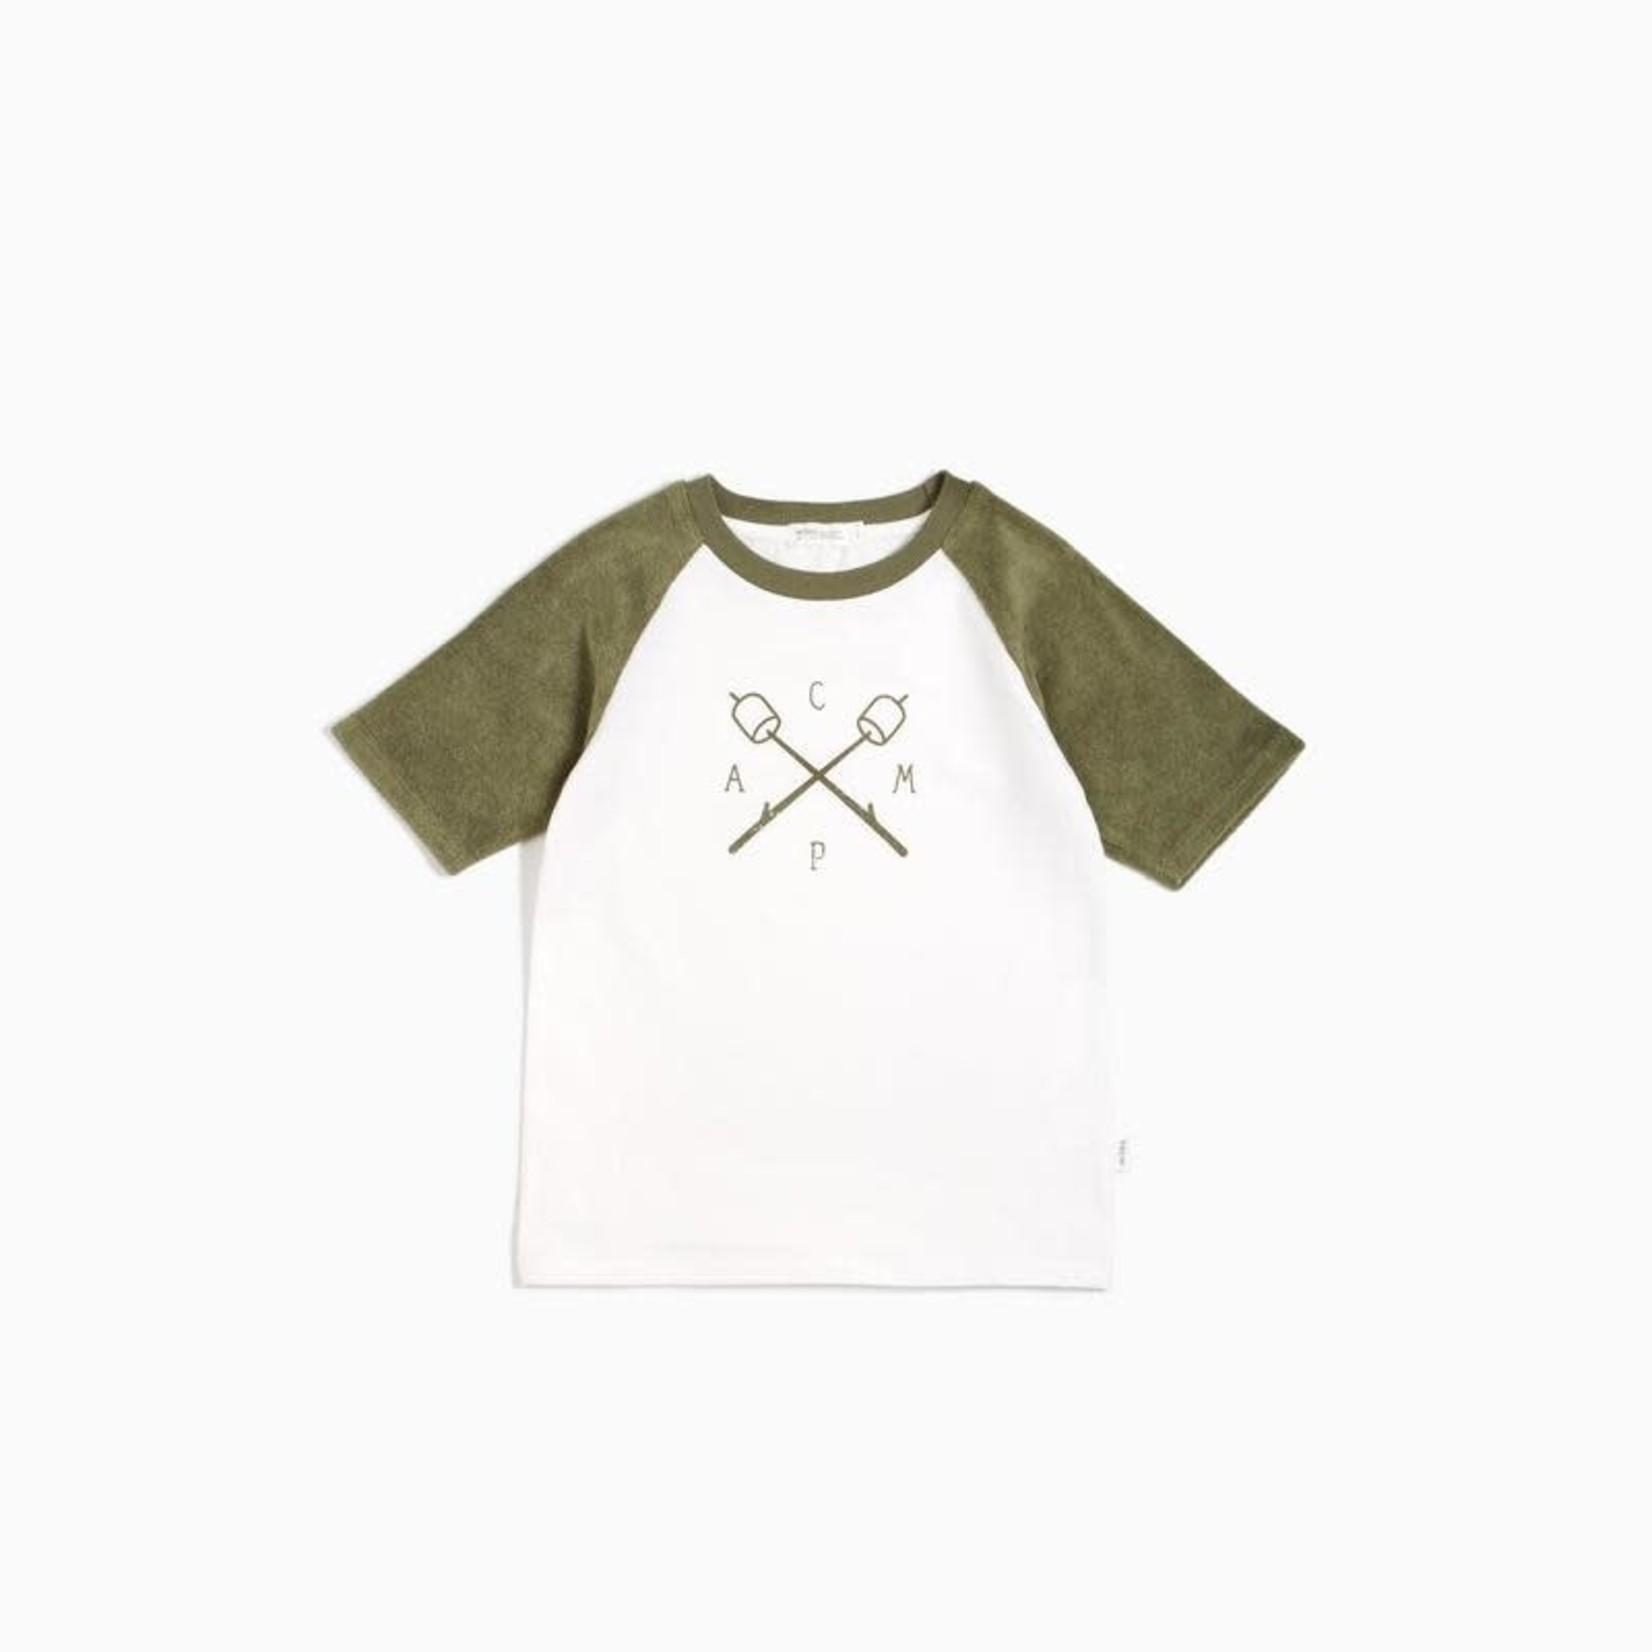 Miles Baby Baby S/S Tee - Green  Camp